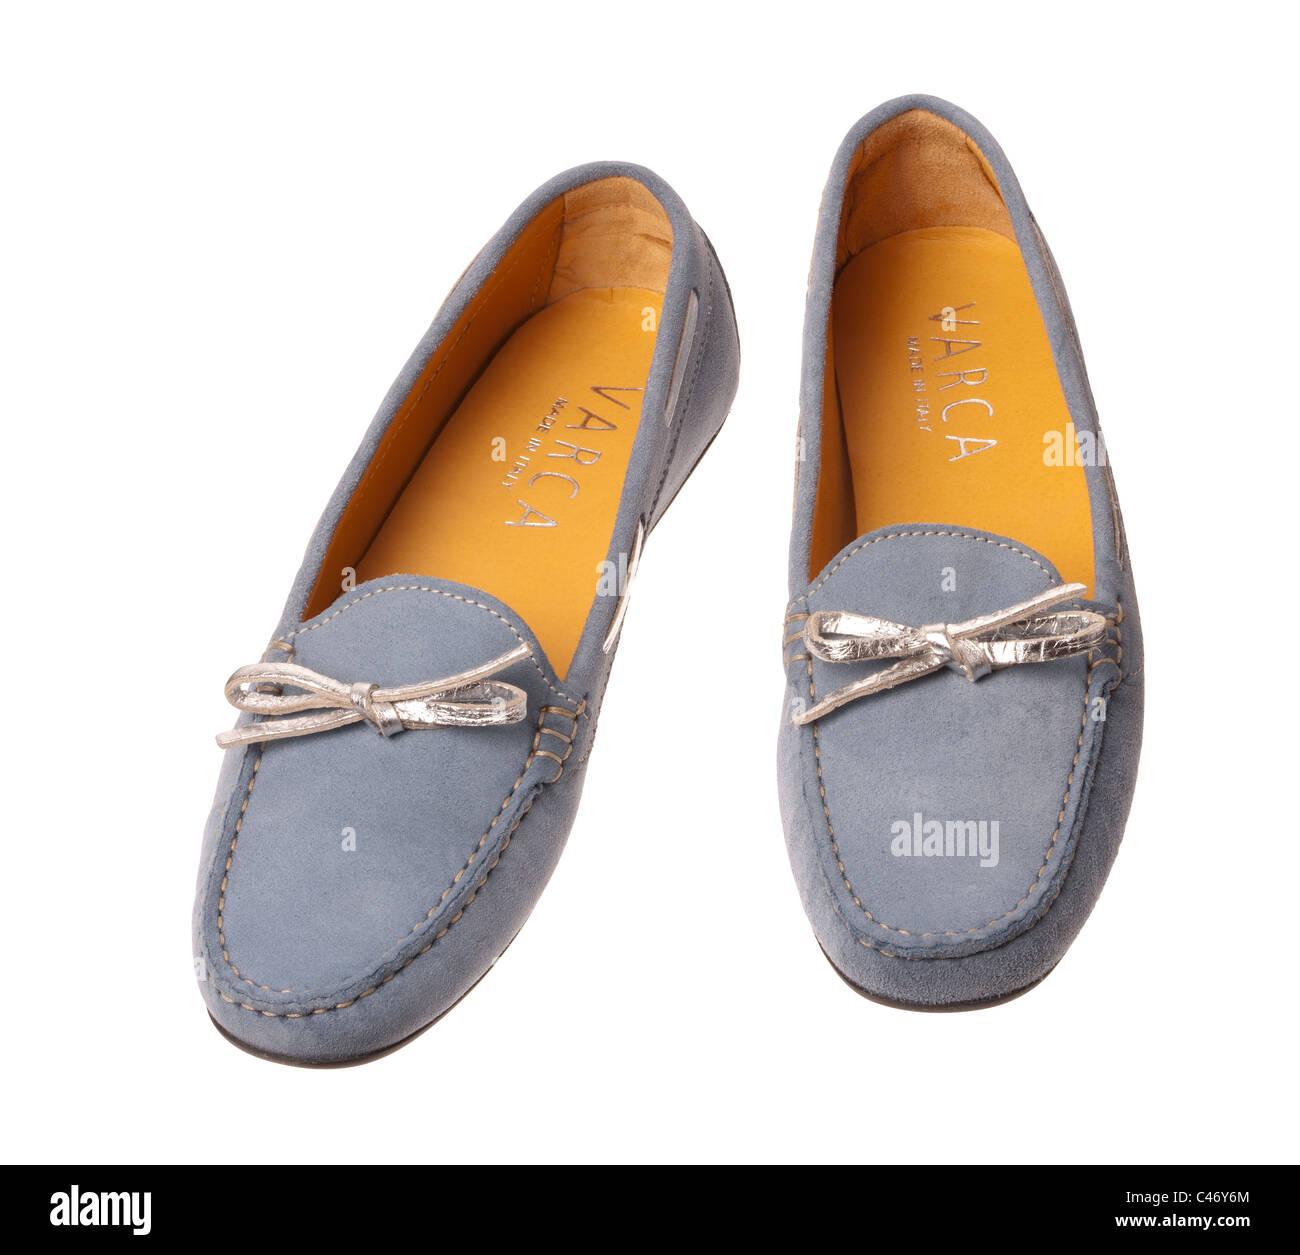 Ein paar Sommer blau Veloursleder Loafer Schuhe mit silbernen Bögen Stockbild